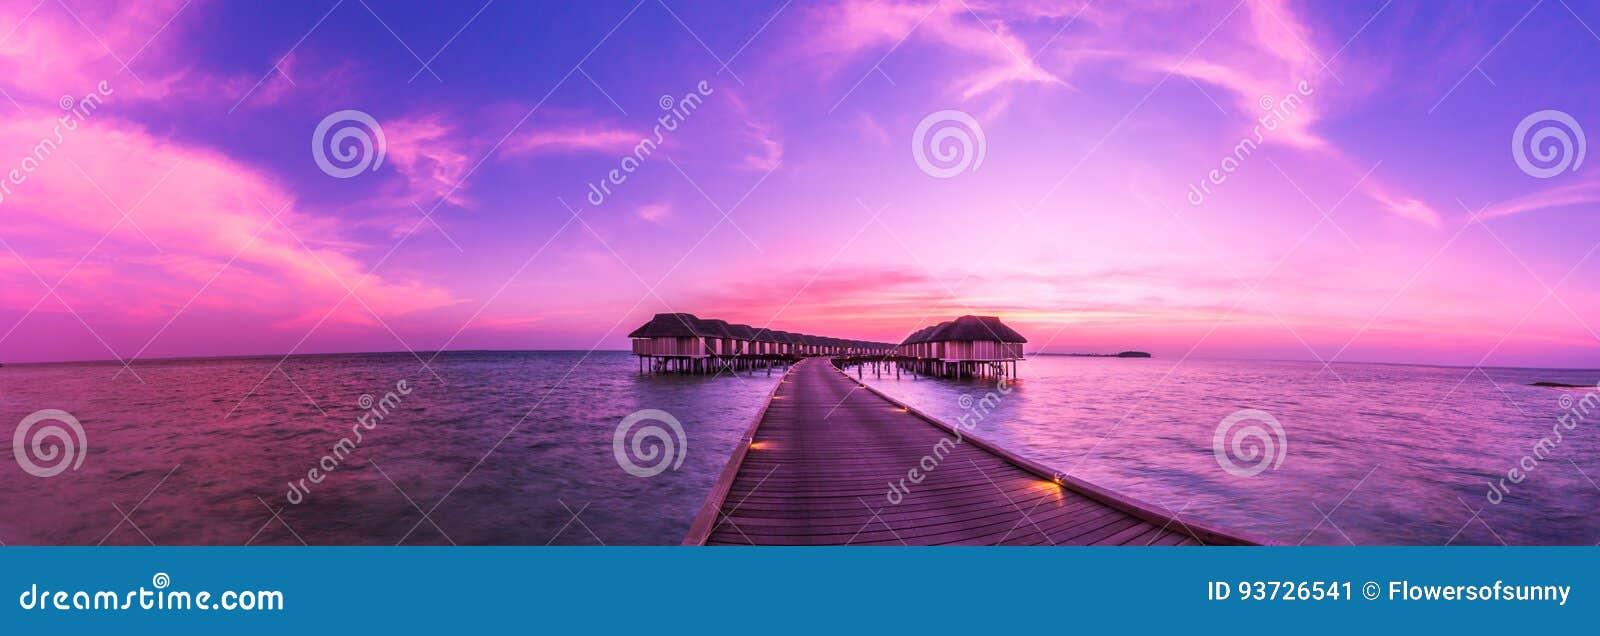 Pink scallop seashell όμορφο τοπίο παραλιών σκηνή φύσης τροπική Φοίνικες και μπλε ουρανός Έννοια καλοκαιρινών διακοπών και διακοπ